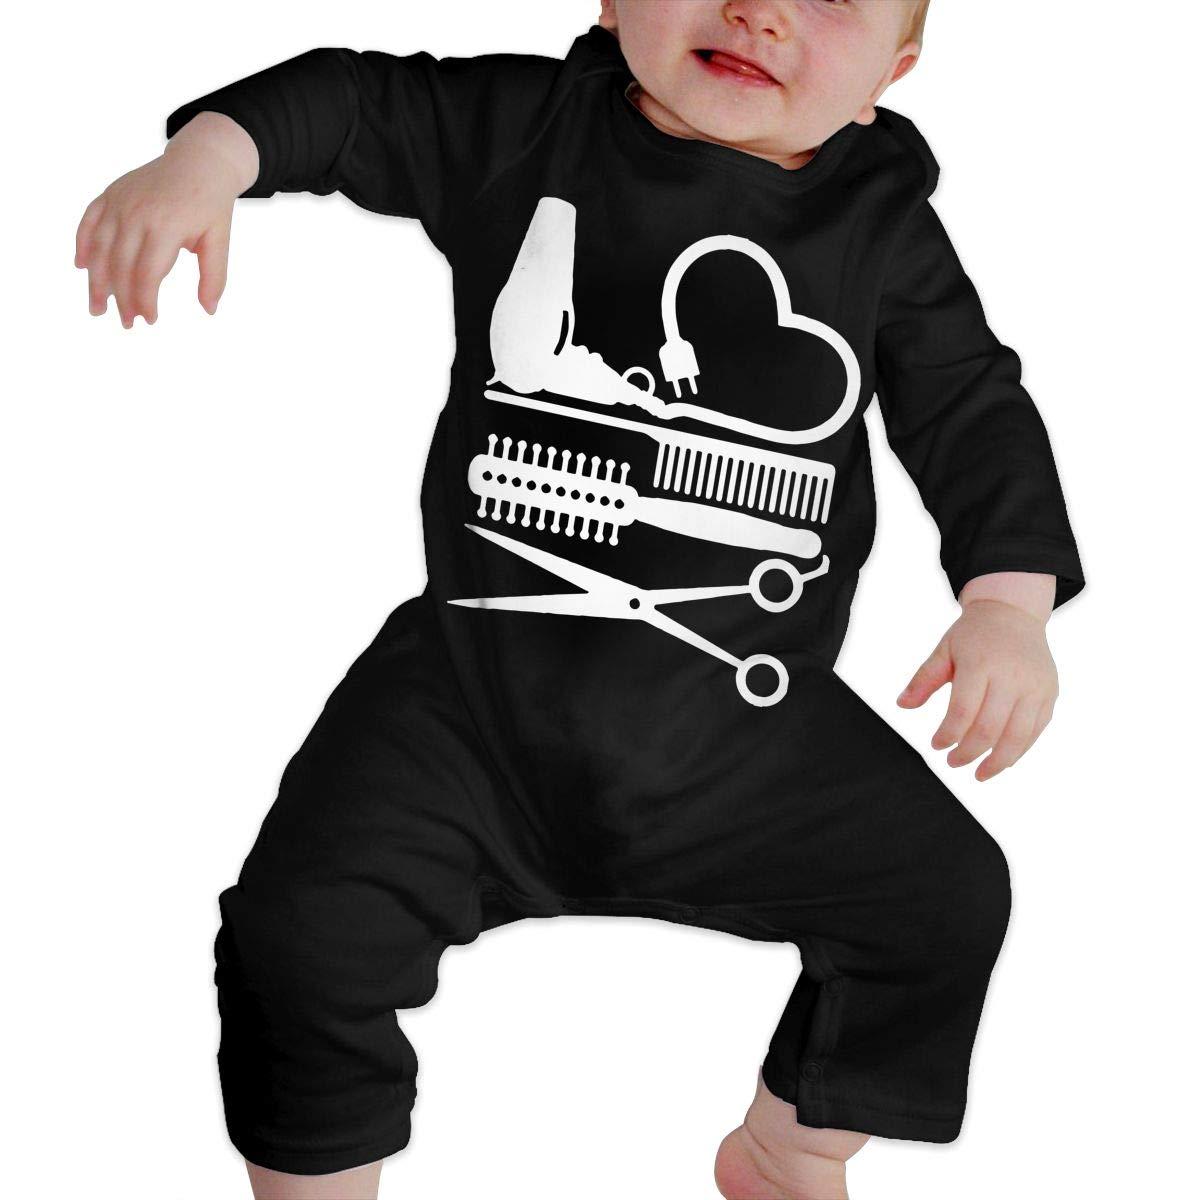 Mri-le1 Newborn Kids Long Sleeve Jumpsuit Hair Stylist Tools Baby Clothes